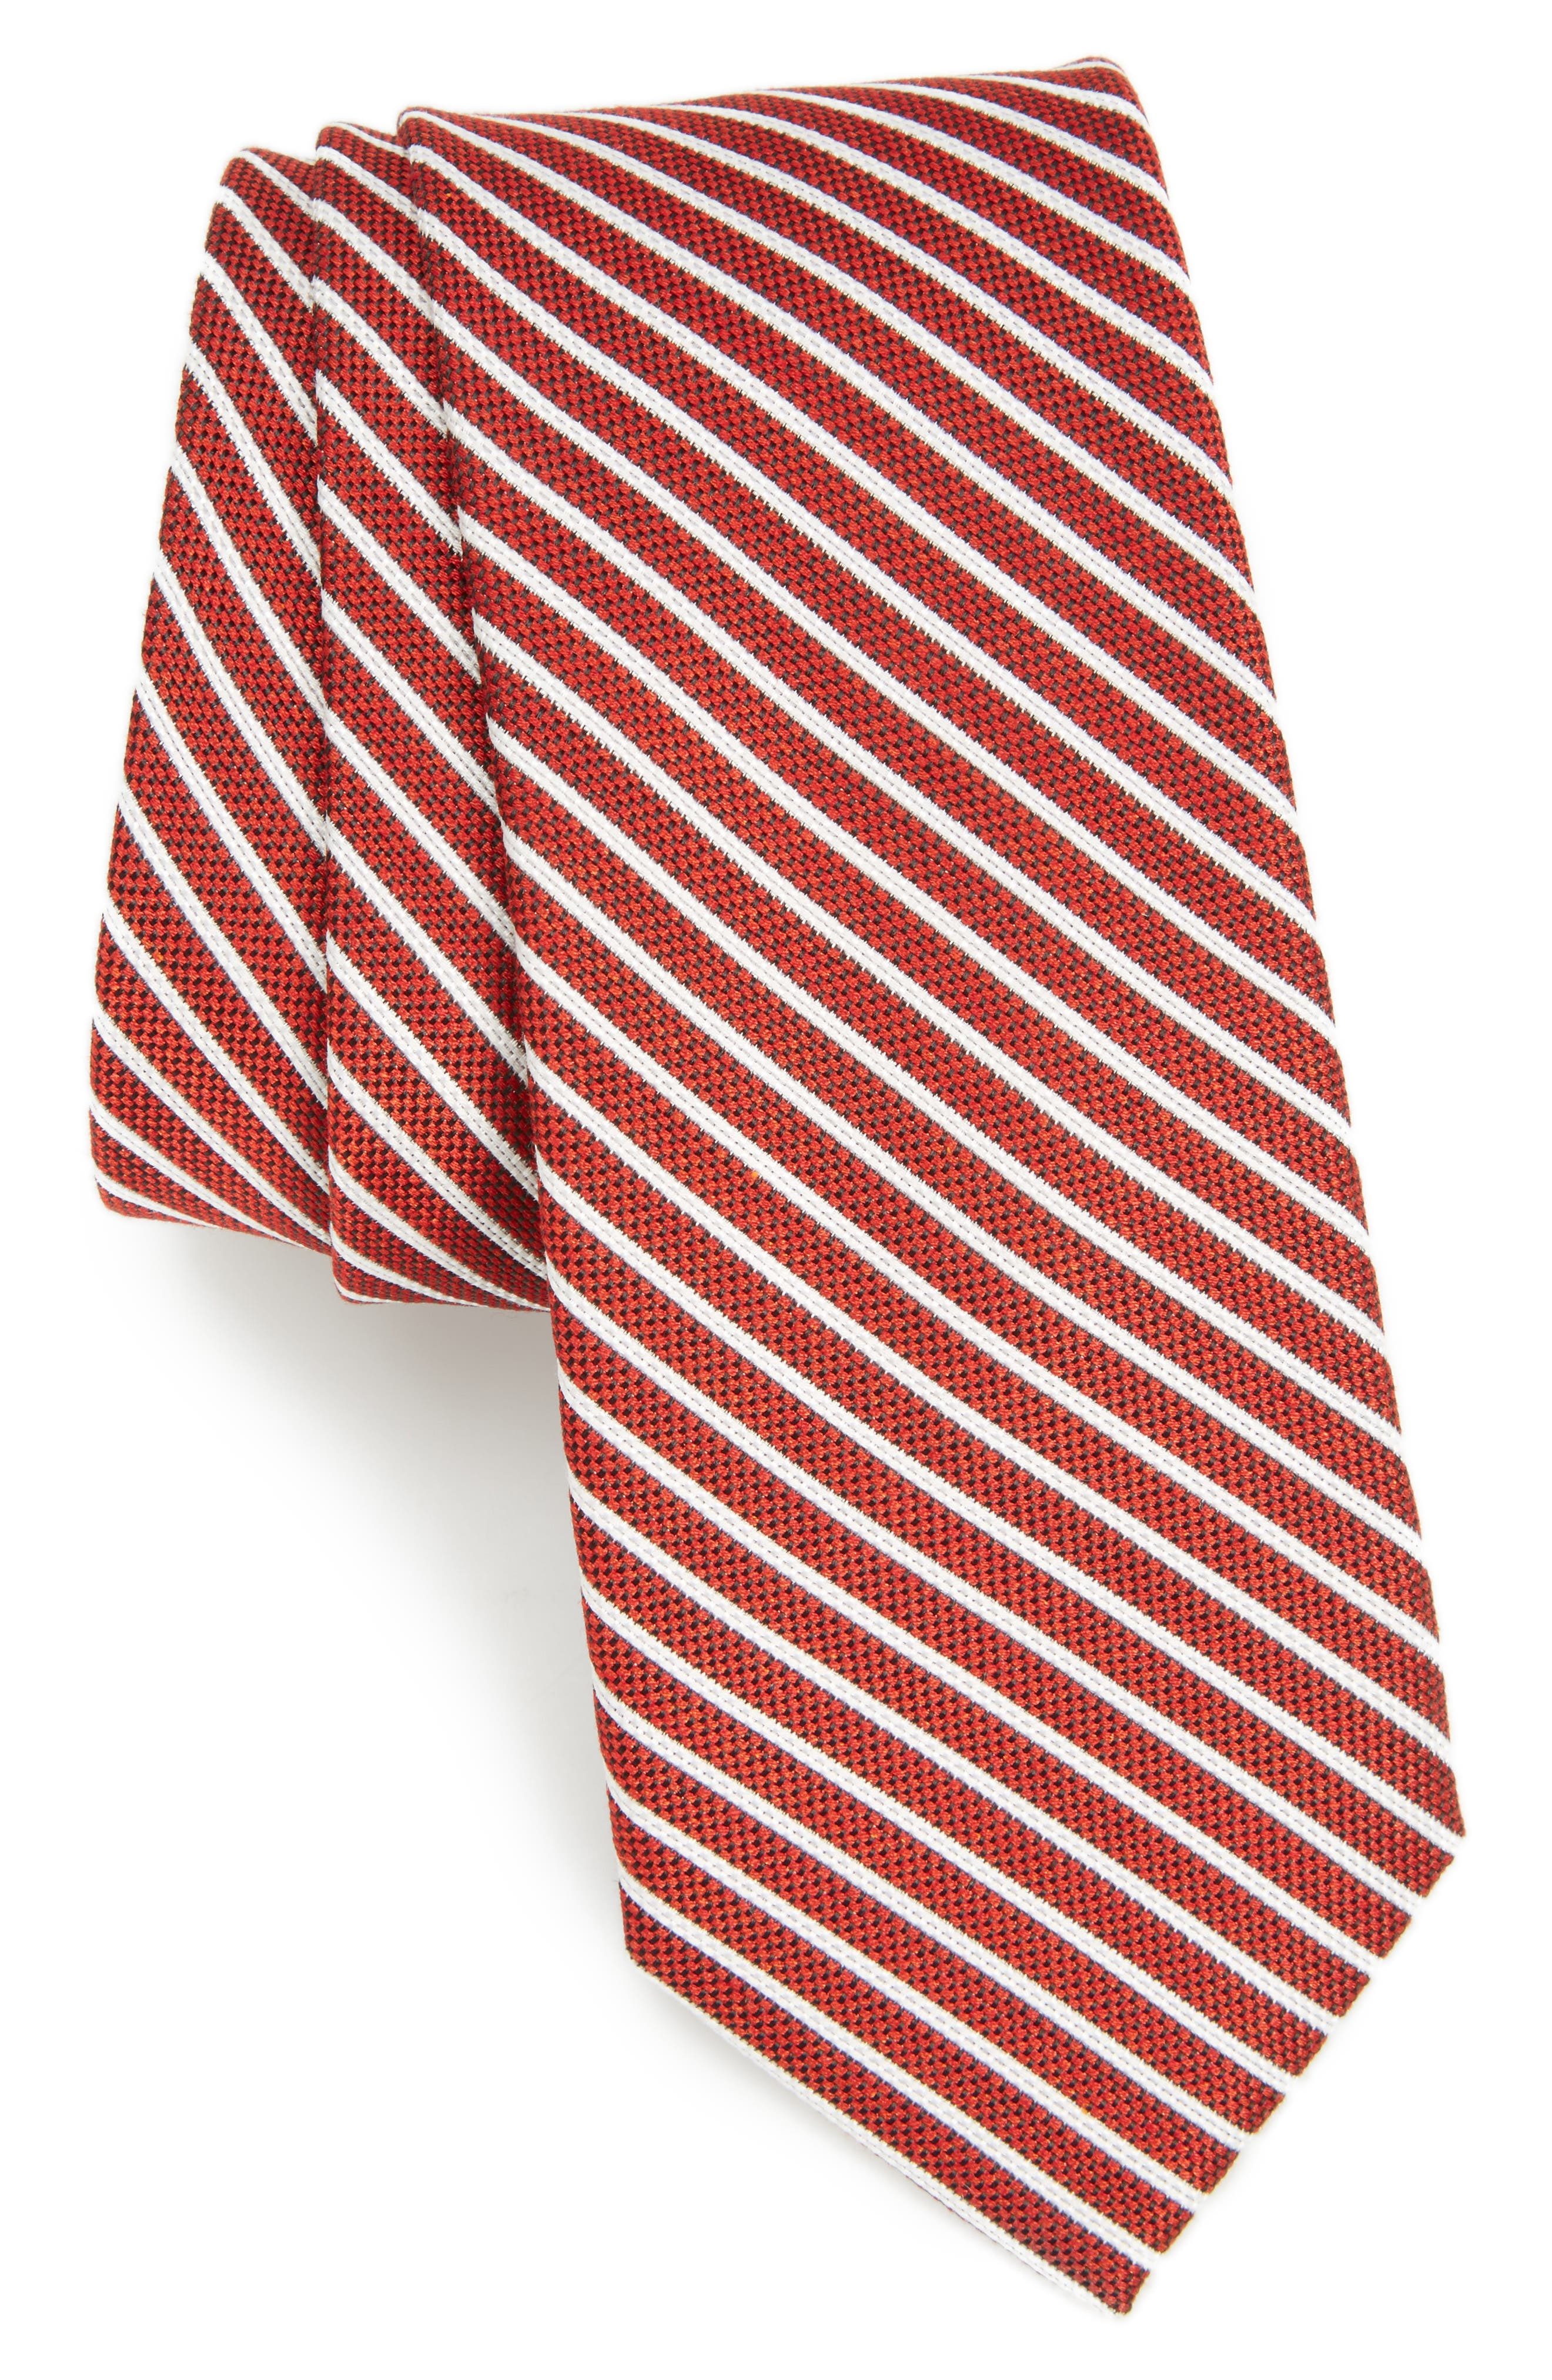 Nordstrom Men's Shop Annadel Stripe Skinny Tie